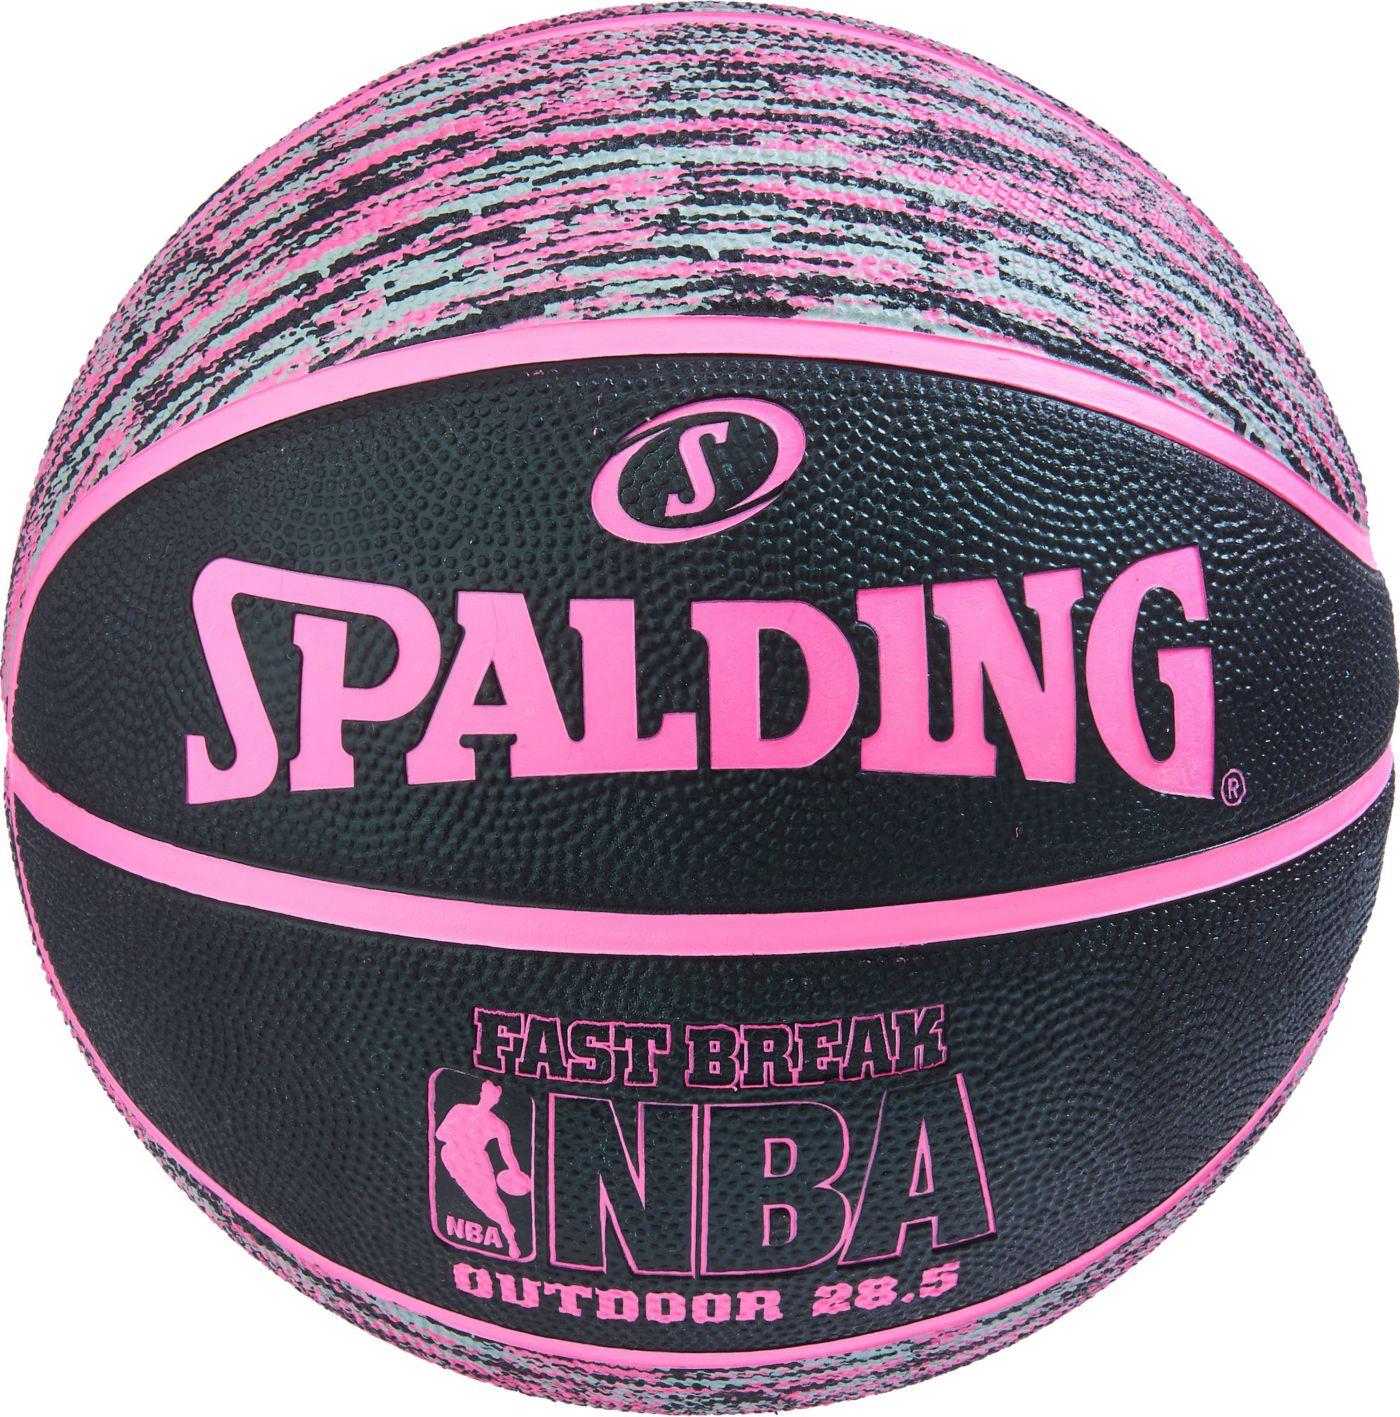 "Spalding NBA Fast Break Basketball (28.5"")"